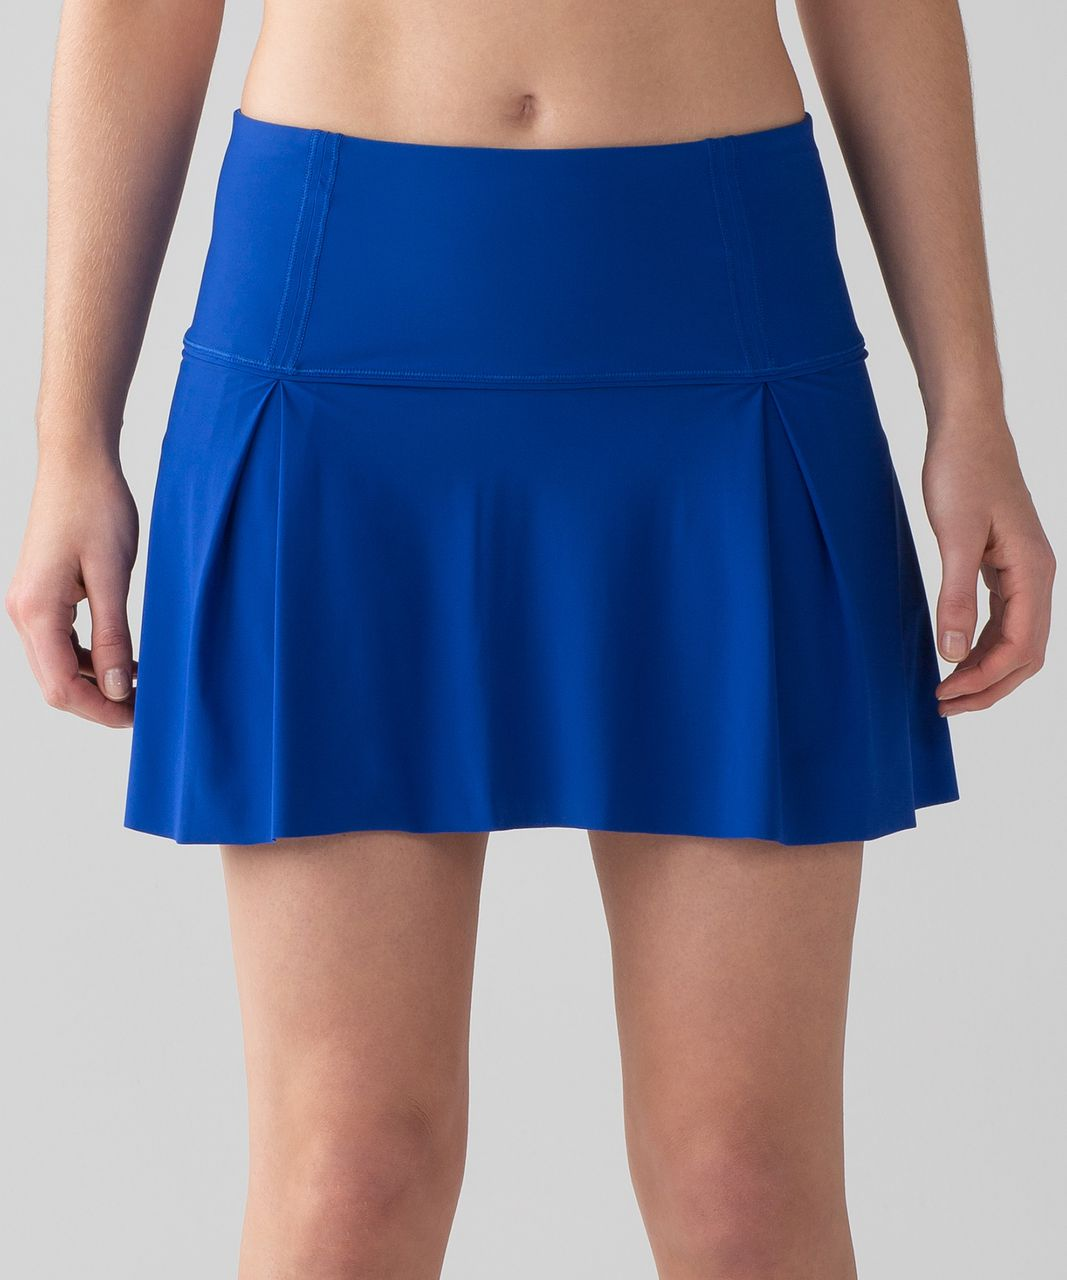 "Lululemon Lost In Pace Skirt (Tall) (15"") - Jet Stream"